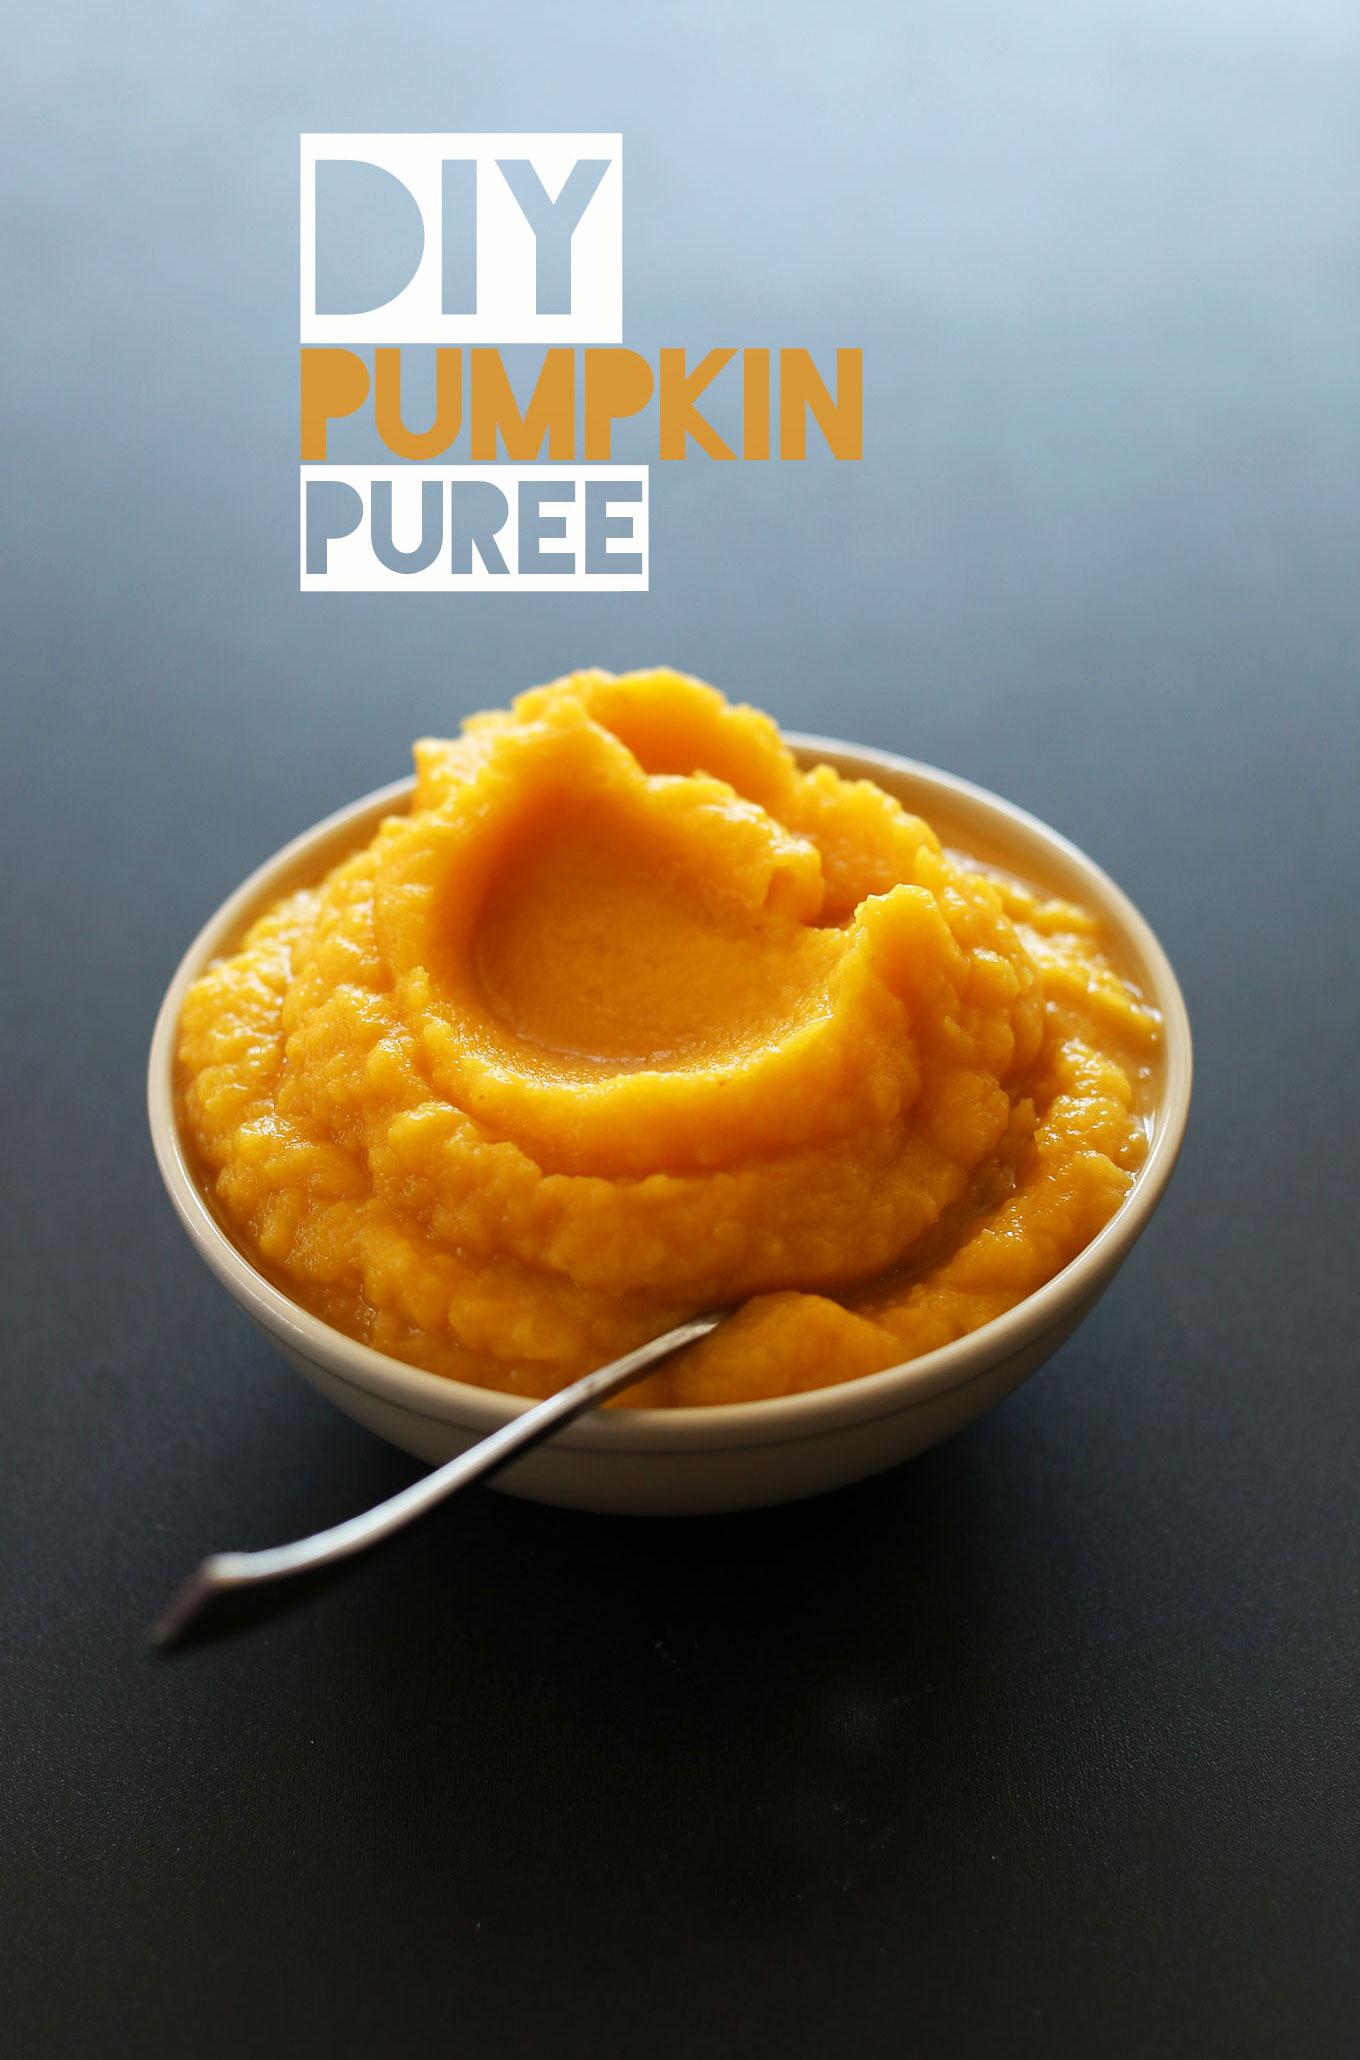 Bowl of our DIY Pumpkin Puree